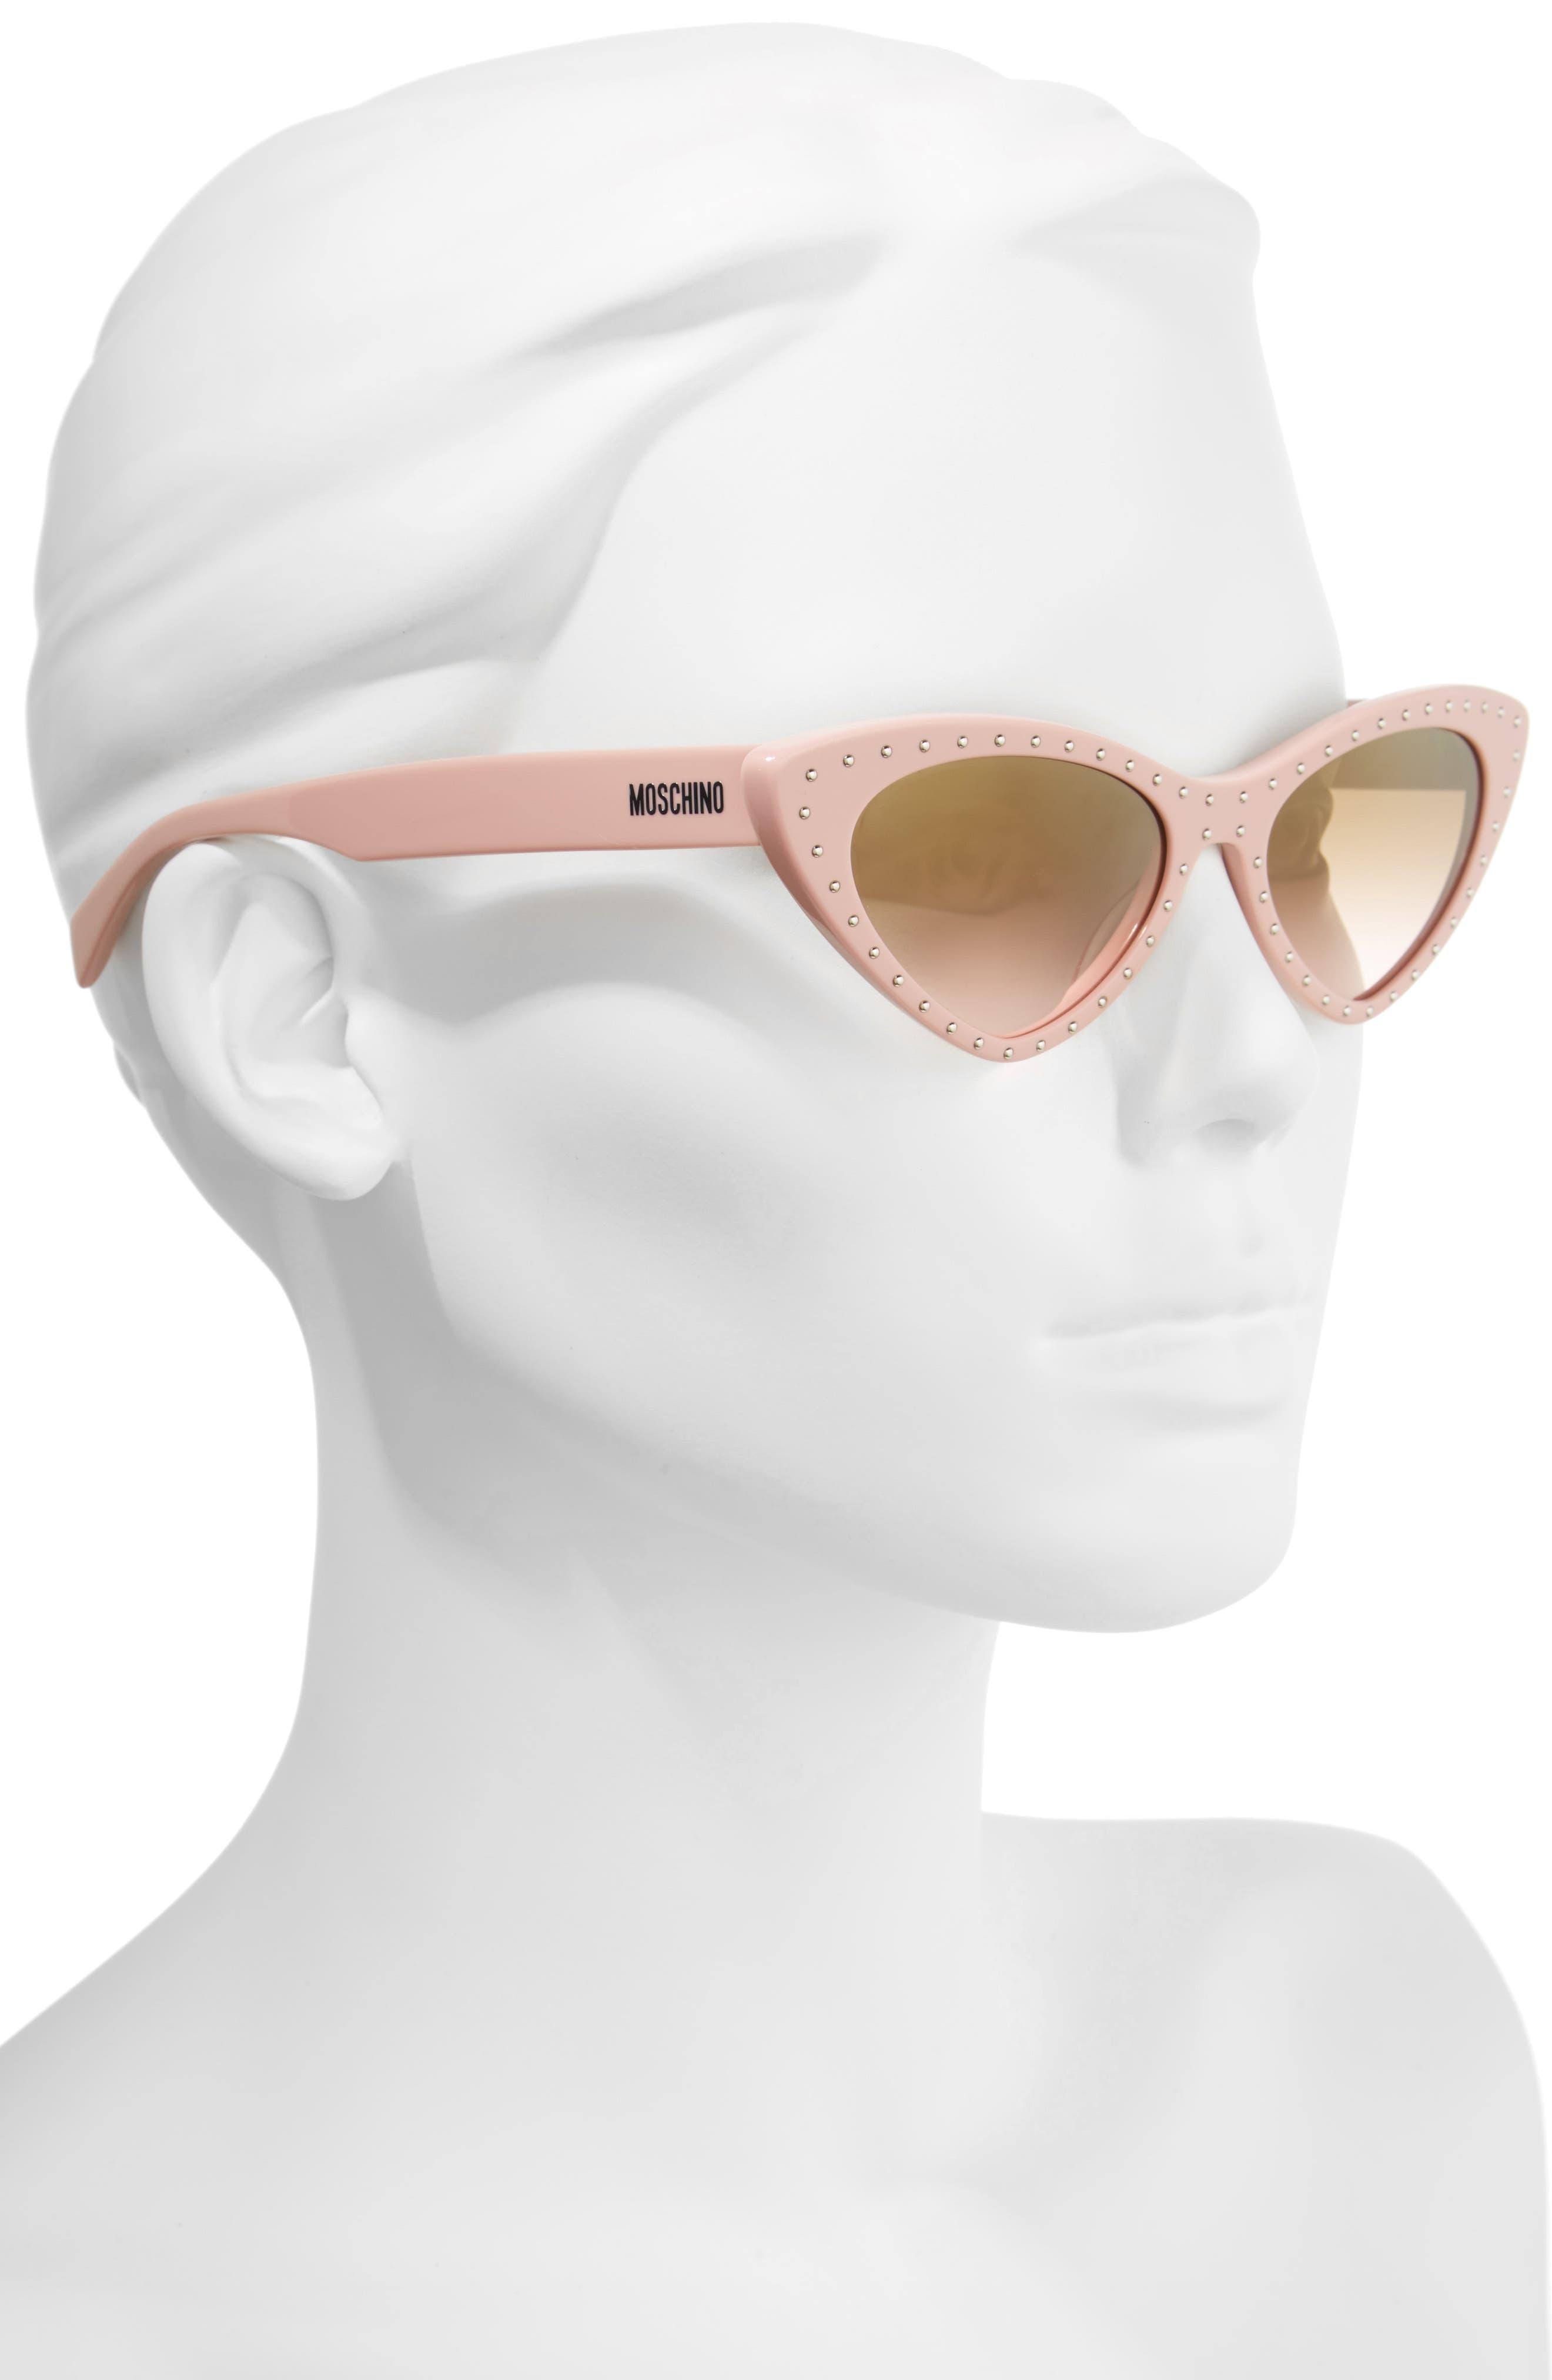 52mm Cat's Eye Sunglasses,                             Alternate thumbnail 2, color,                             PINK